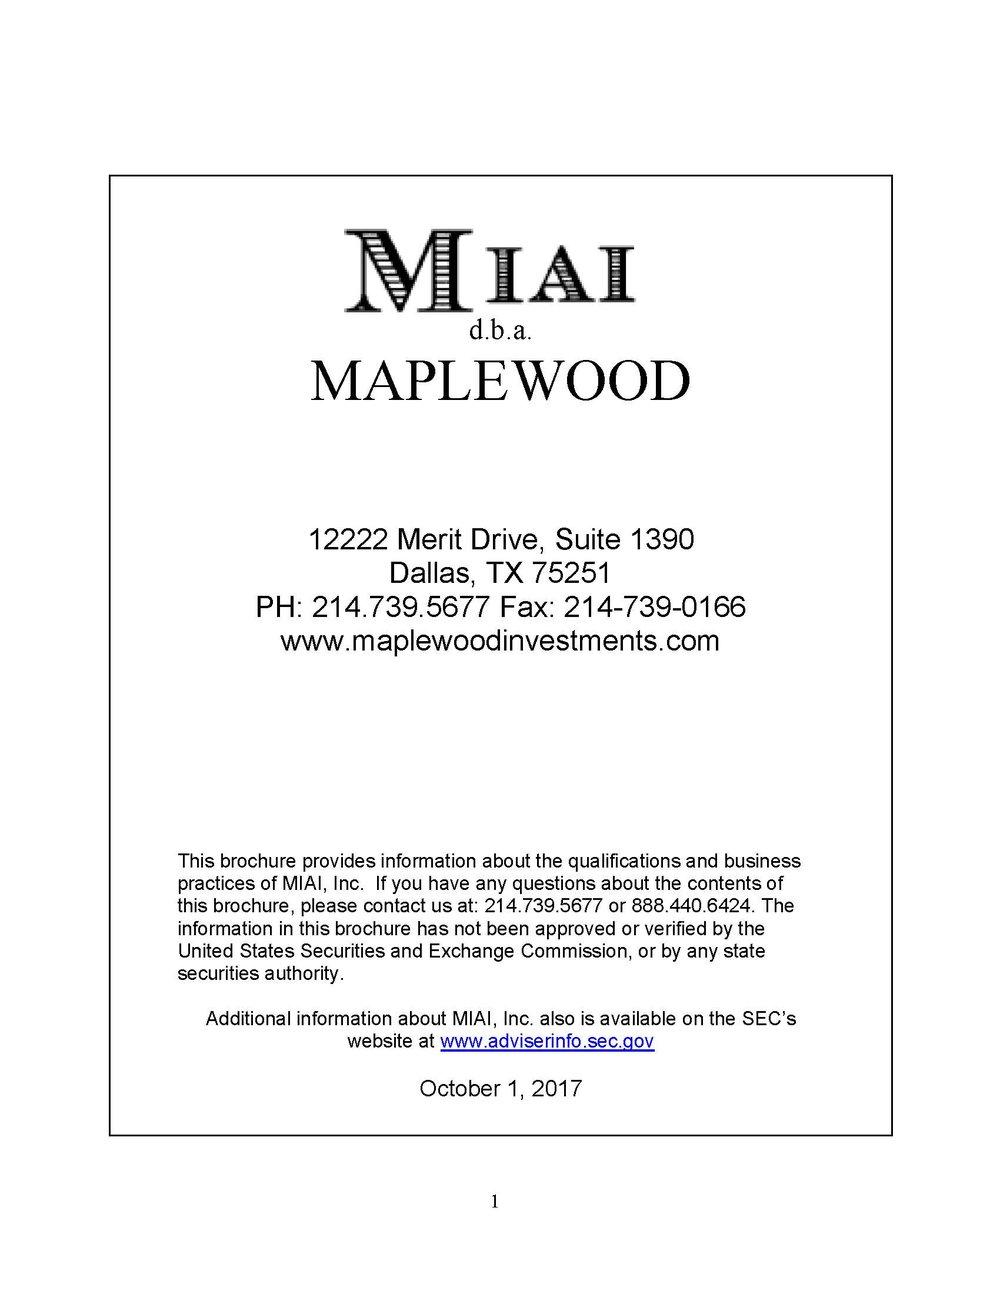 MIAI Brochure 10.1.17_Page_01.jpg